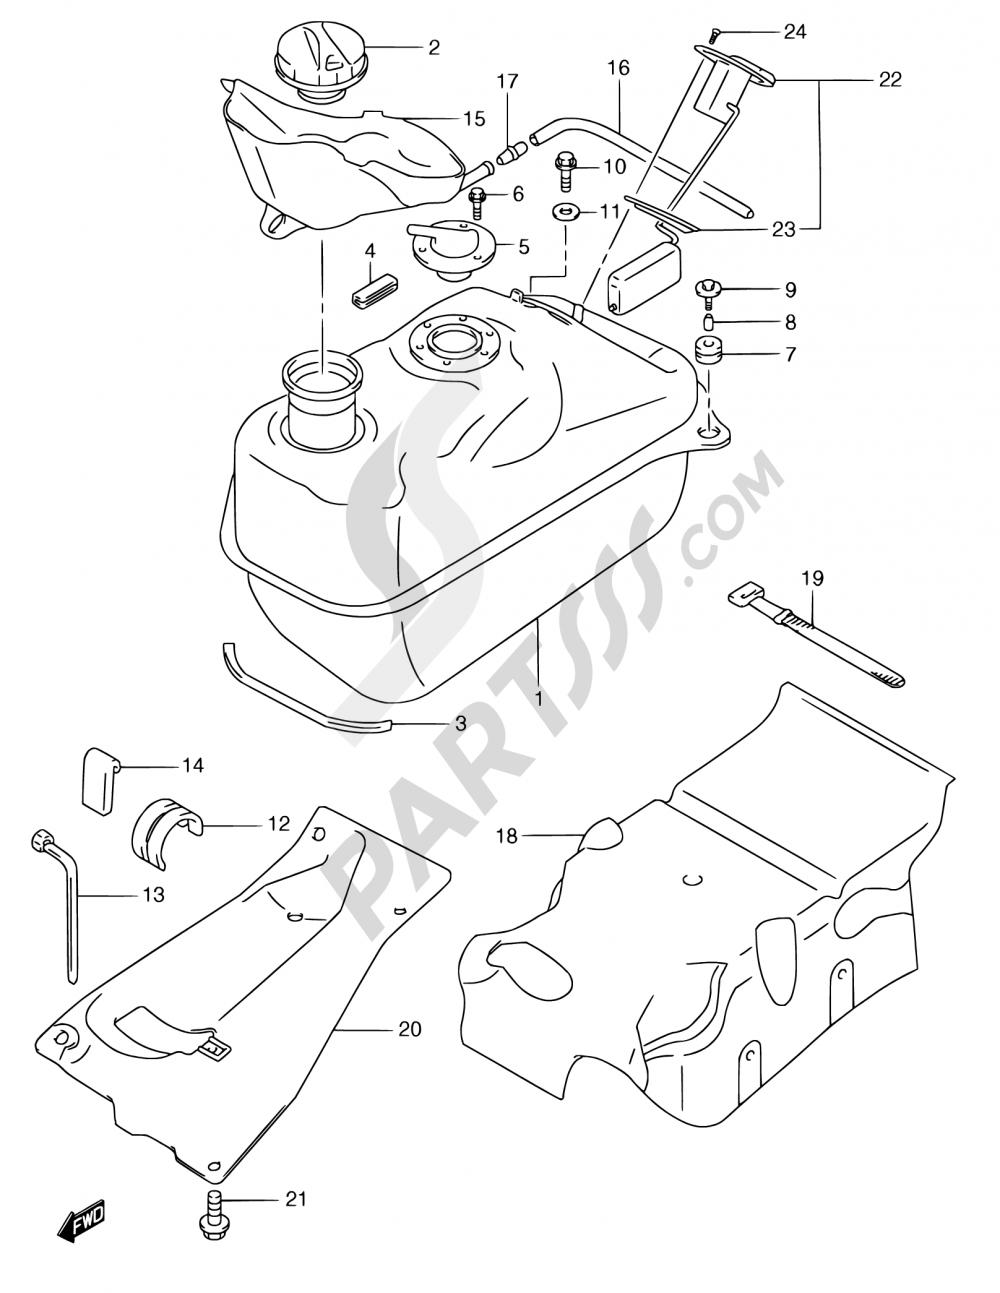 34 - FUEL TANK (MODEL W/X/Y) Suzuki BURGMAN AN250 1999